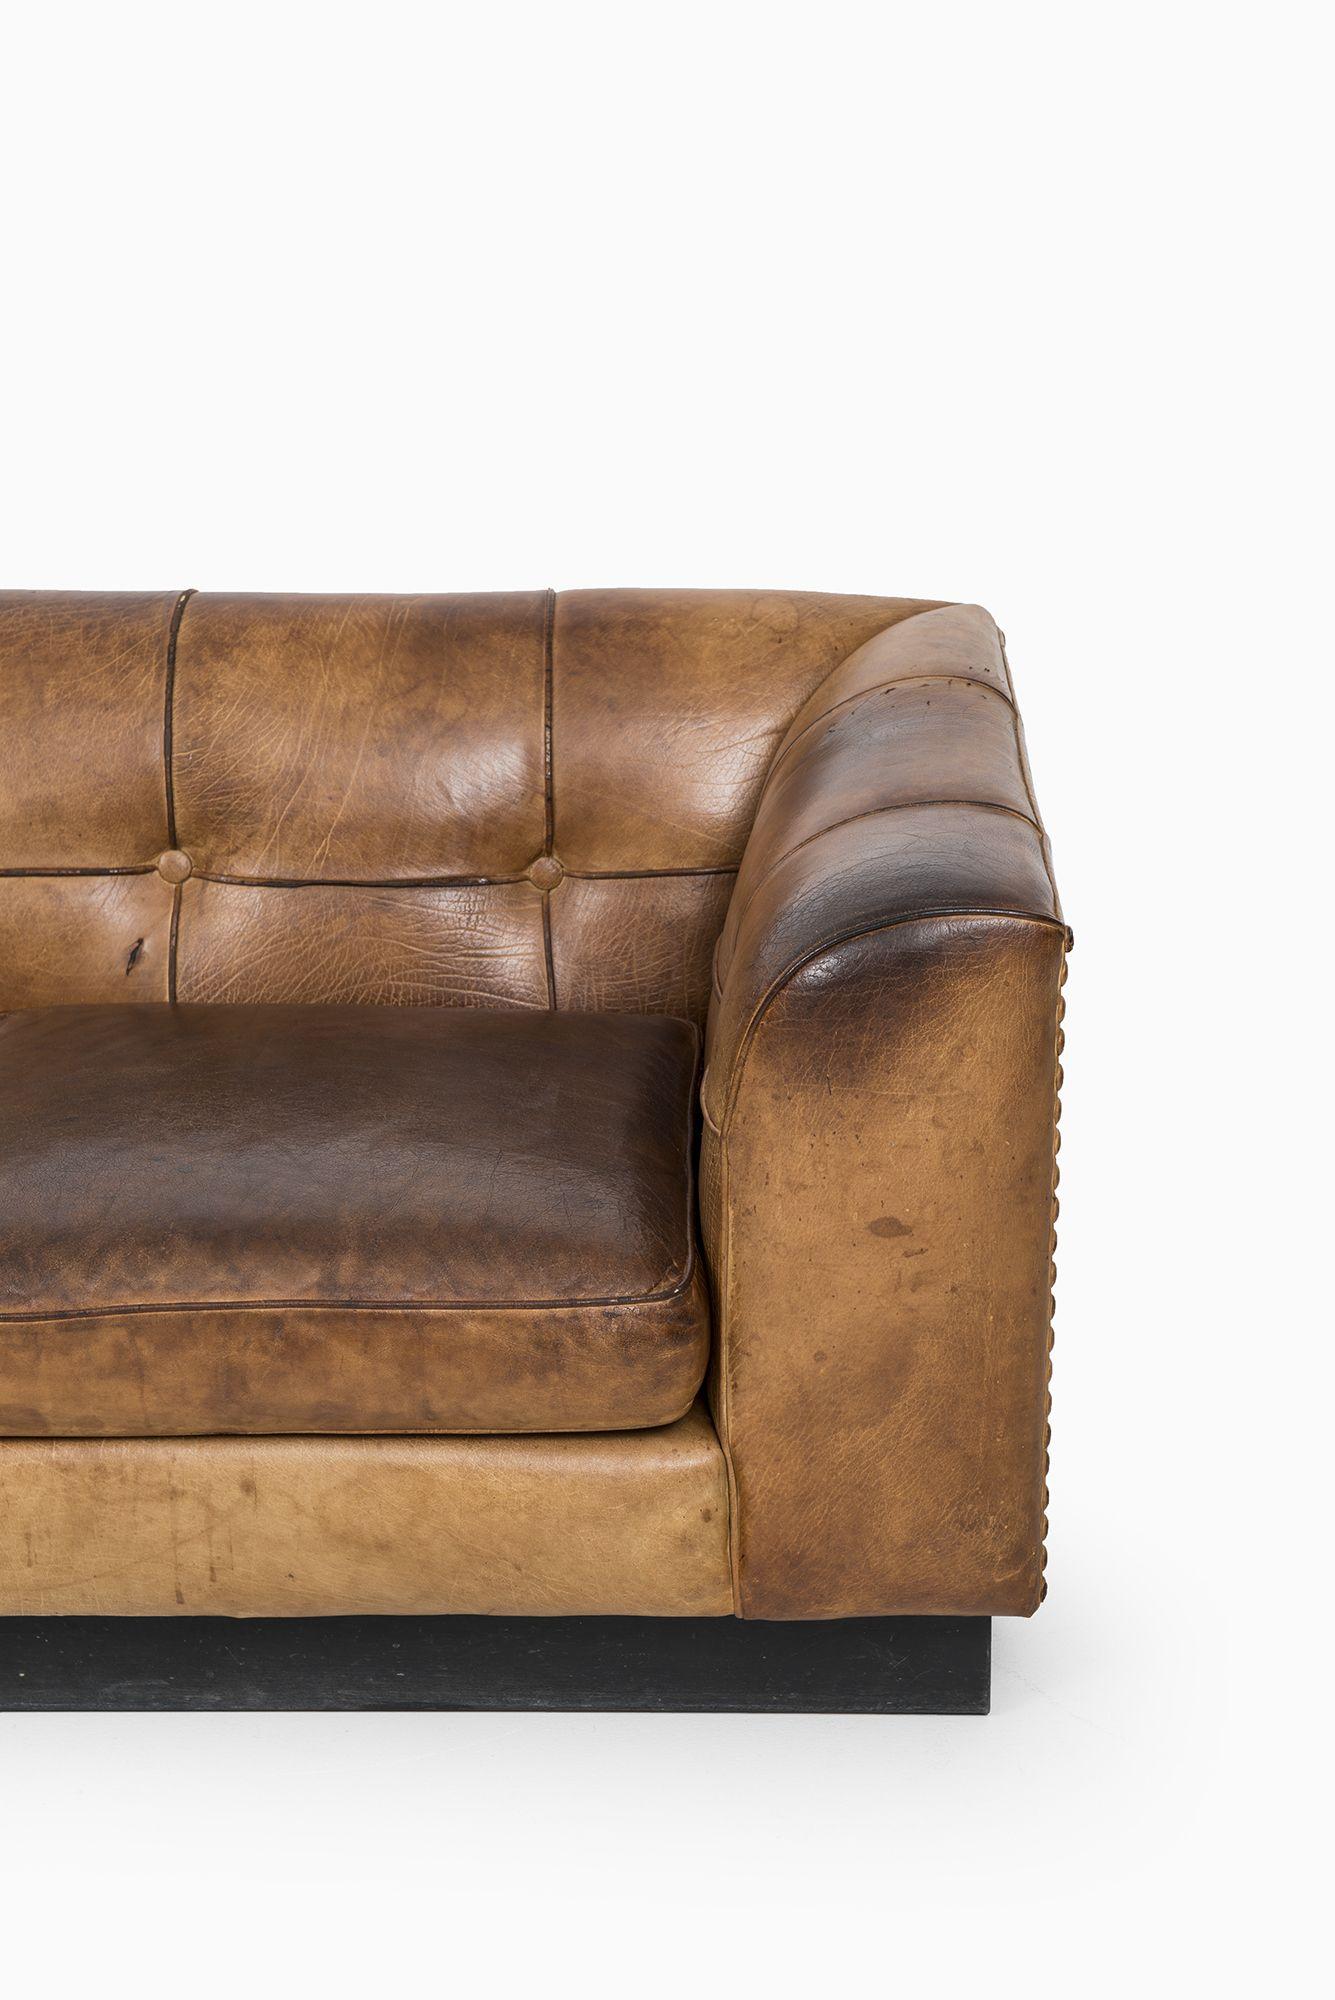 Arne Norell Cognac Brown Buffalo Leather Sofa At Studio Schalling